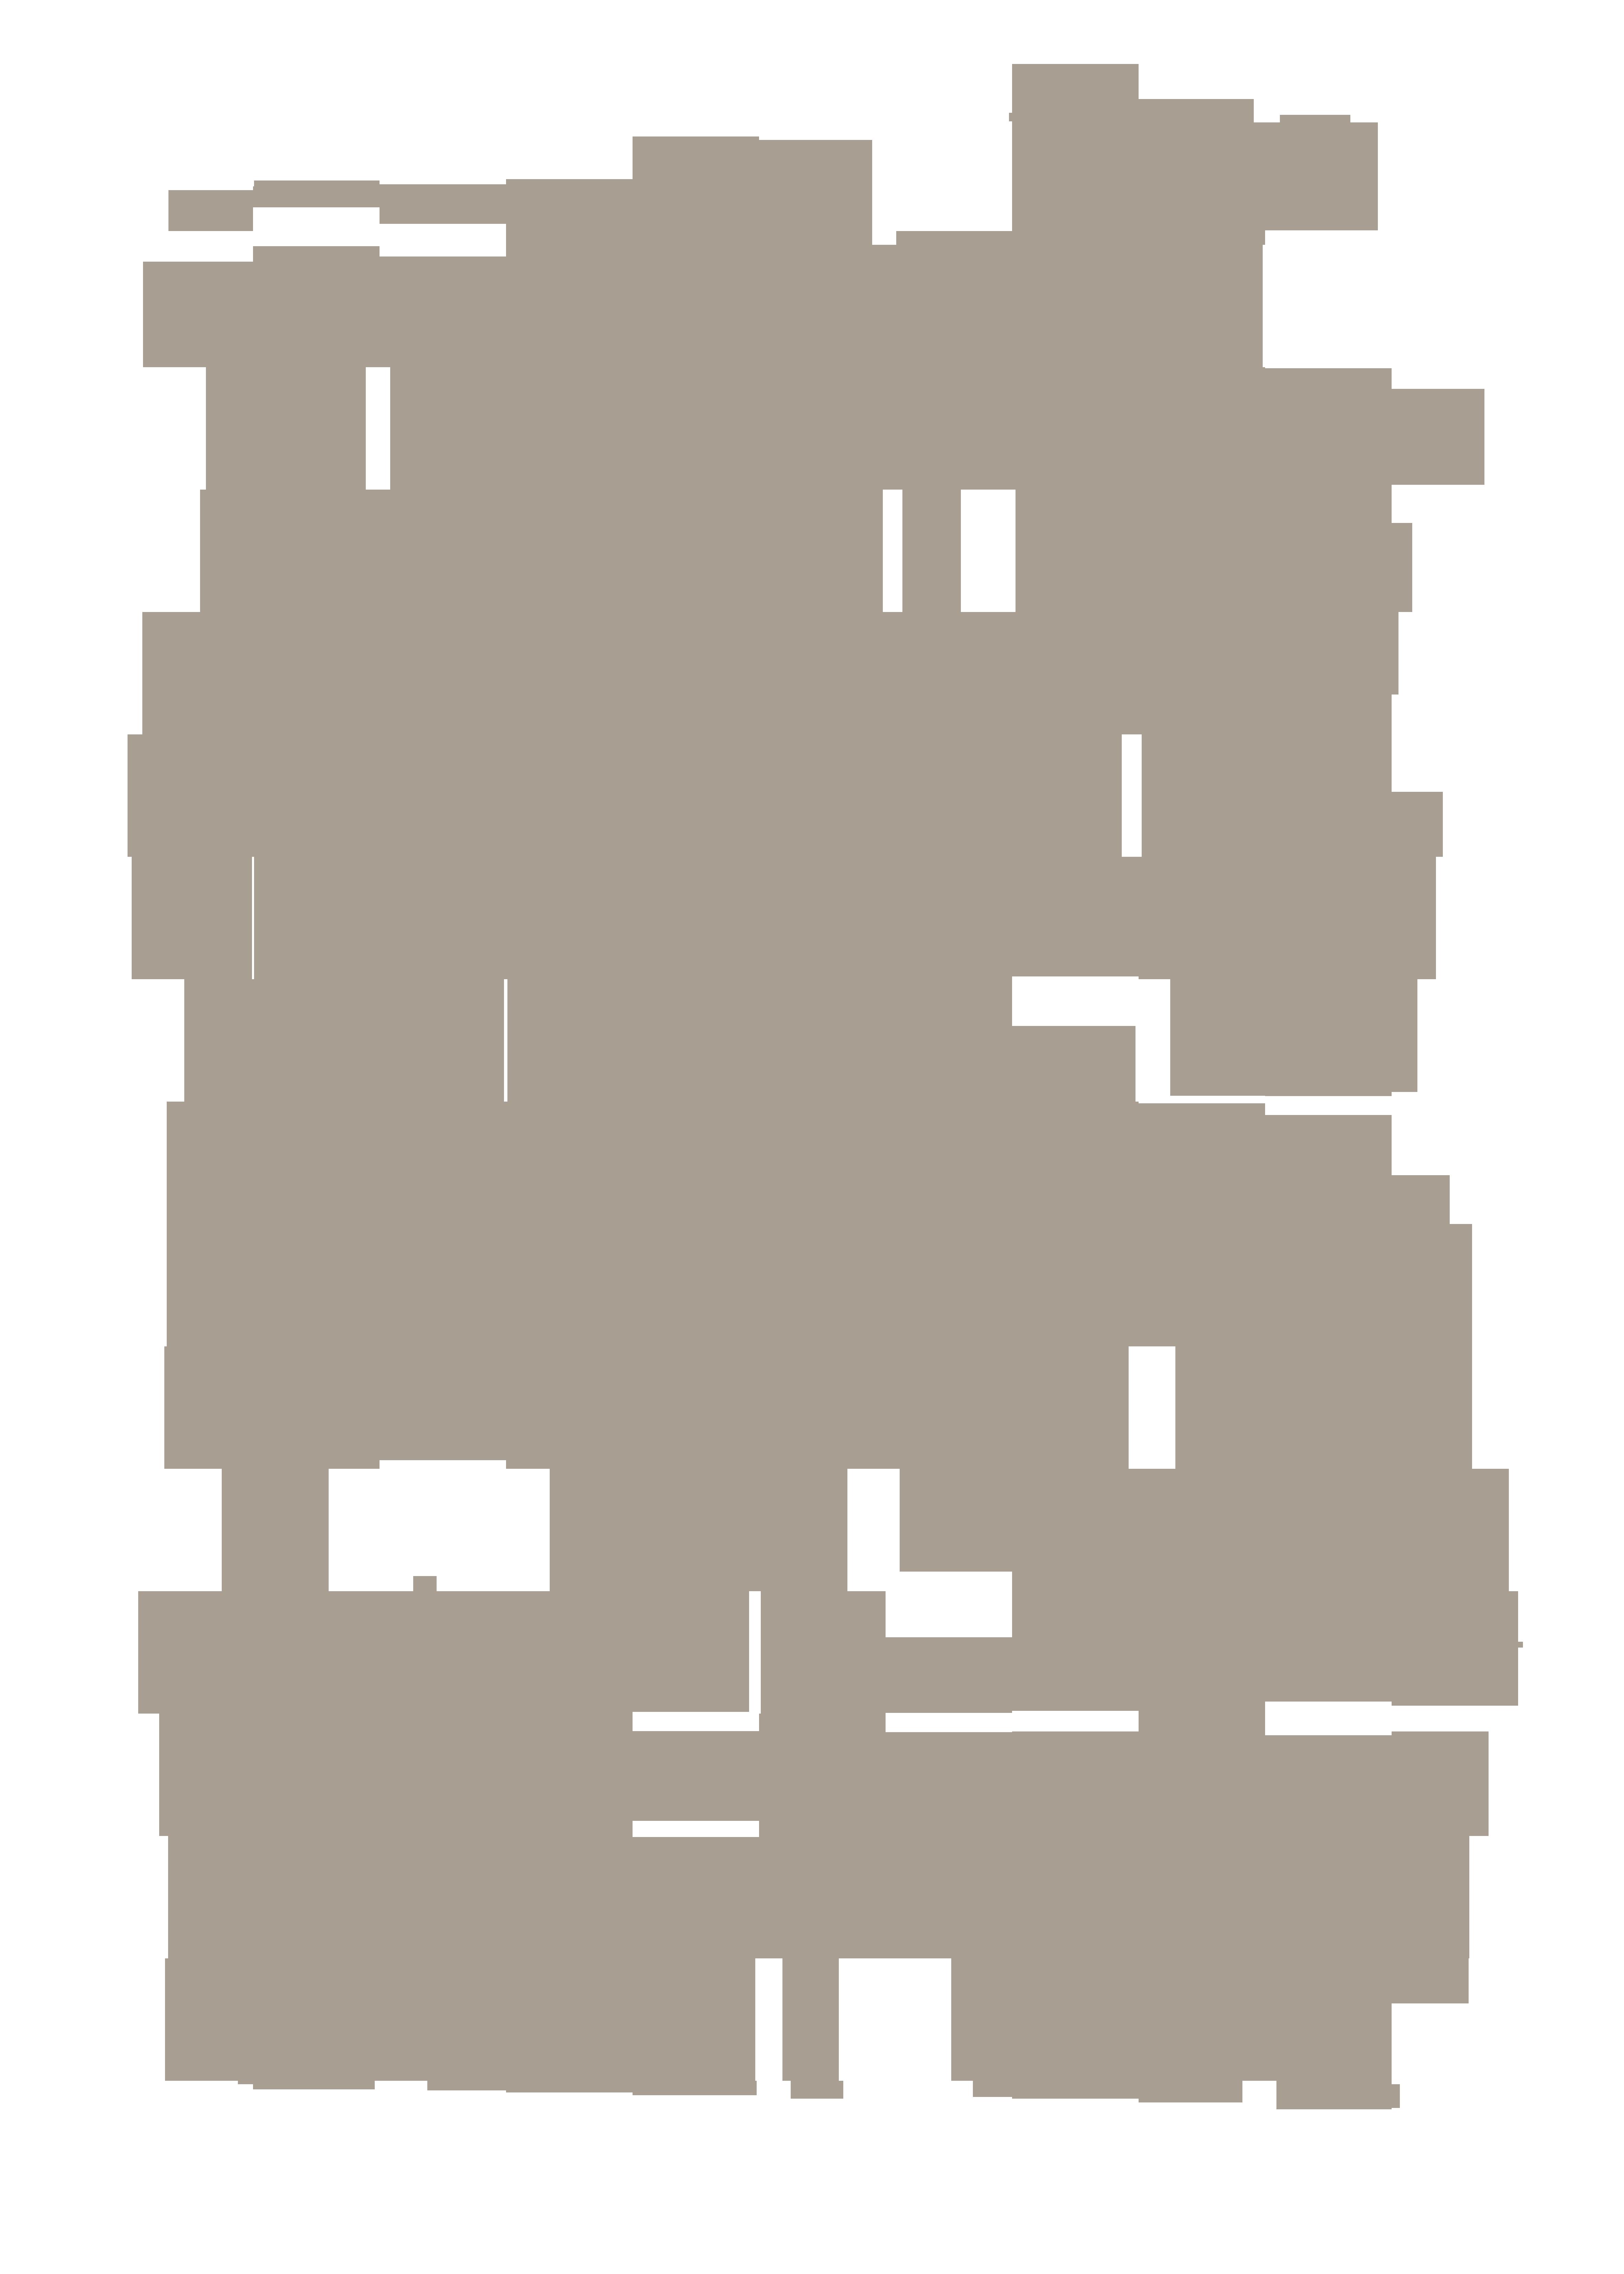 Toothless, Ltd. Needs A Vintage Hockey Camp T-Shirt!